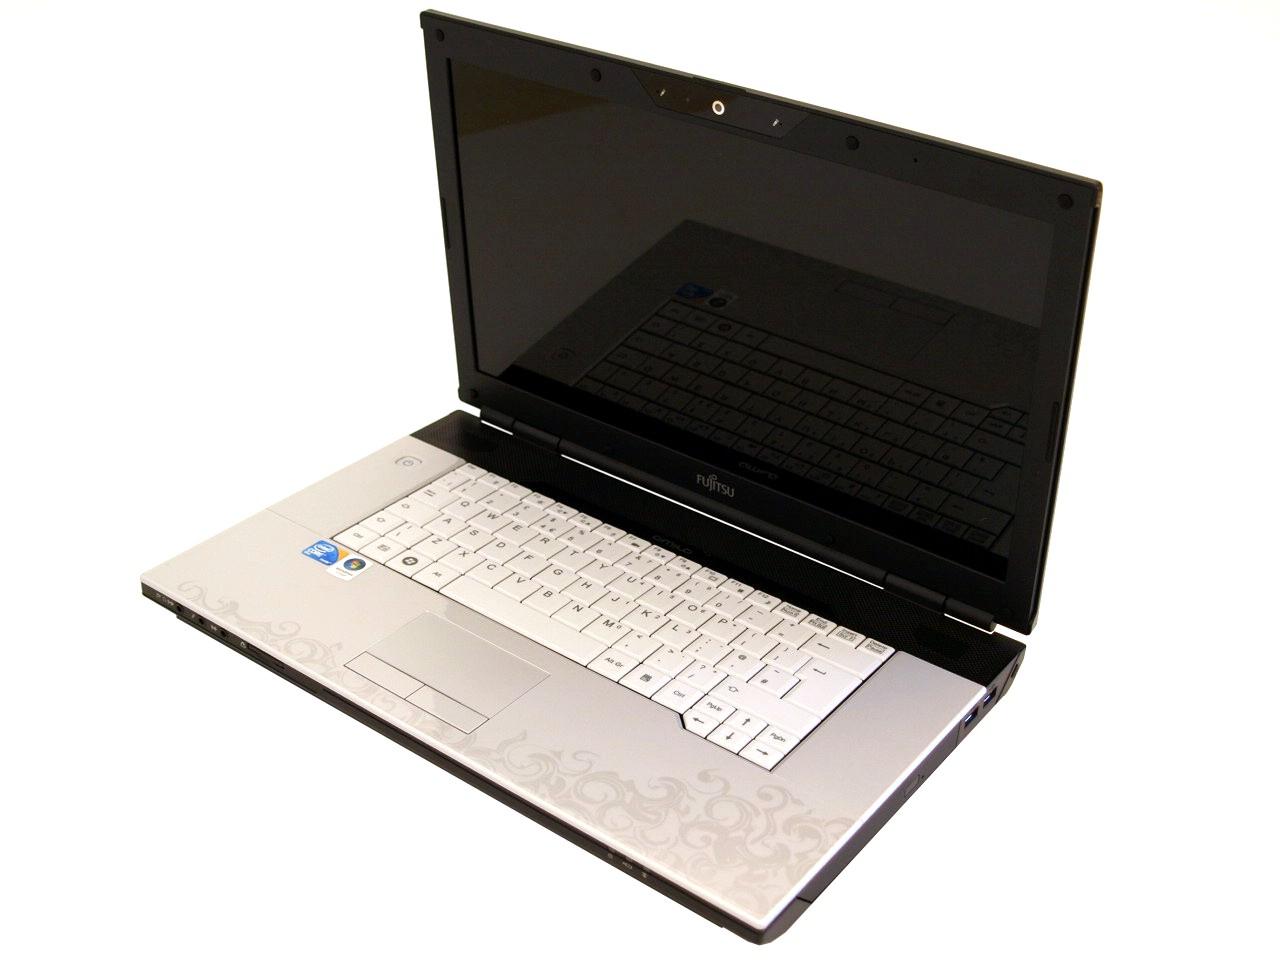 Intel pm45